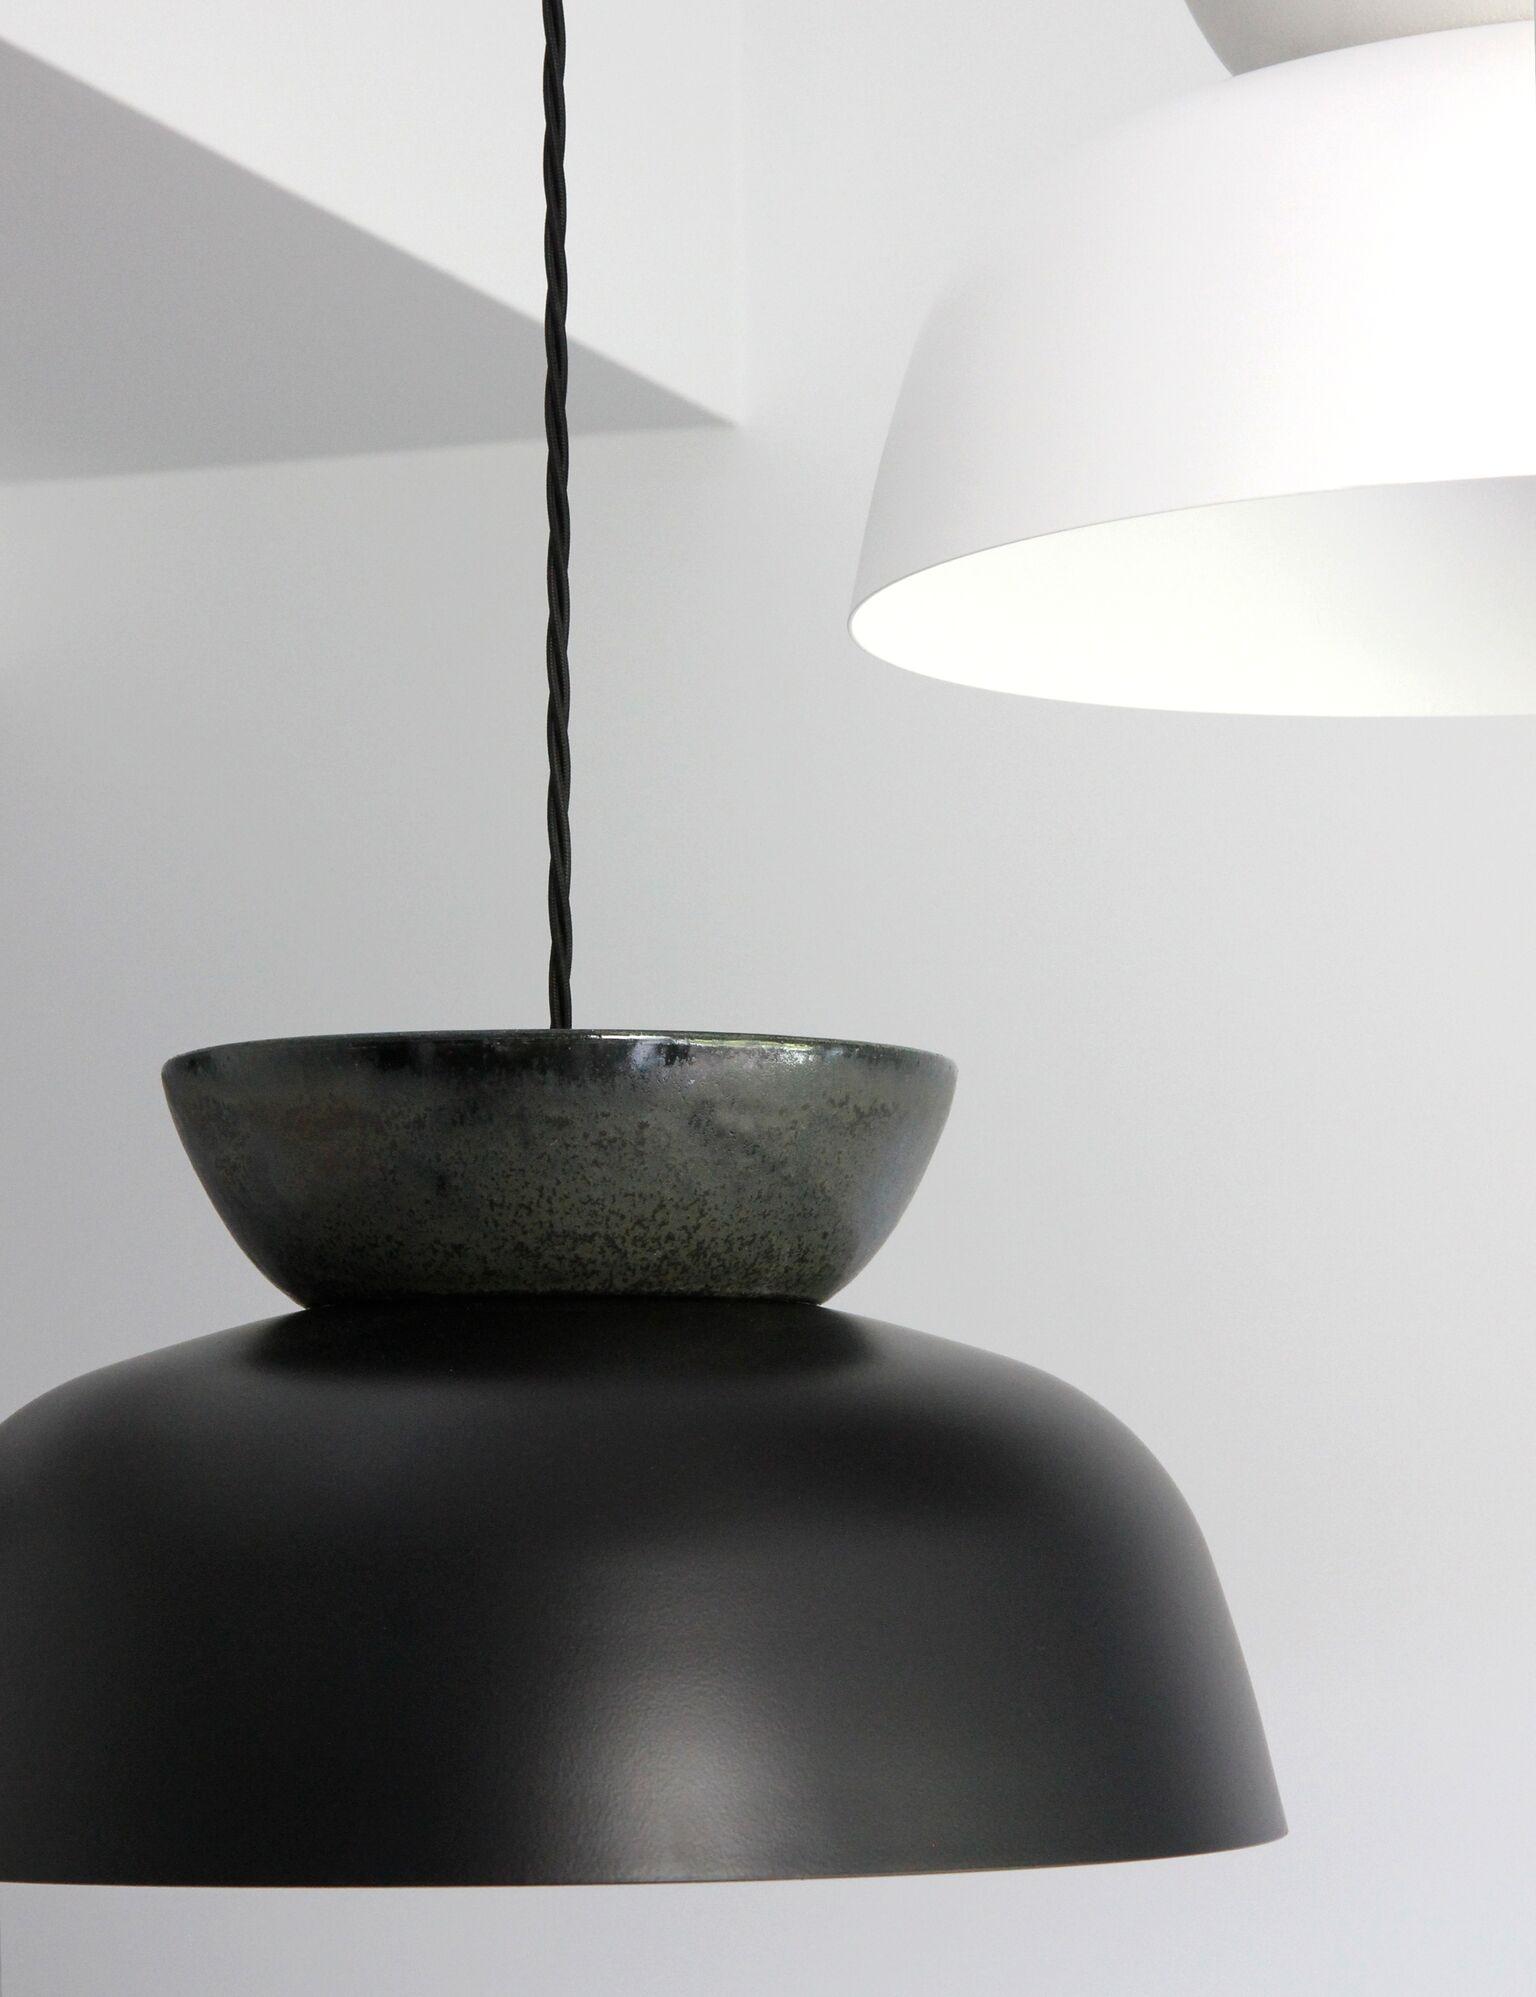 Luke Mills of LUMIL Melbourne based lighting and industrial designer